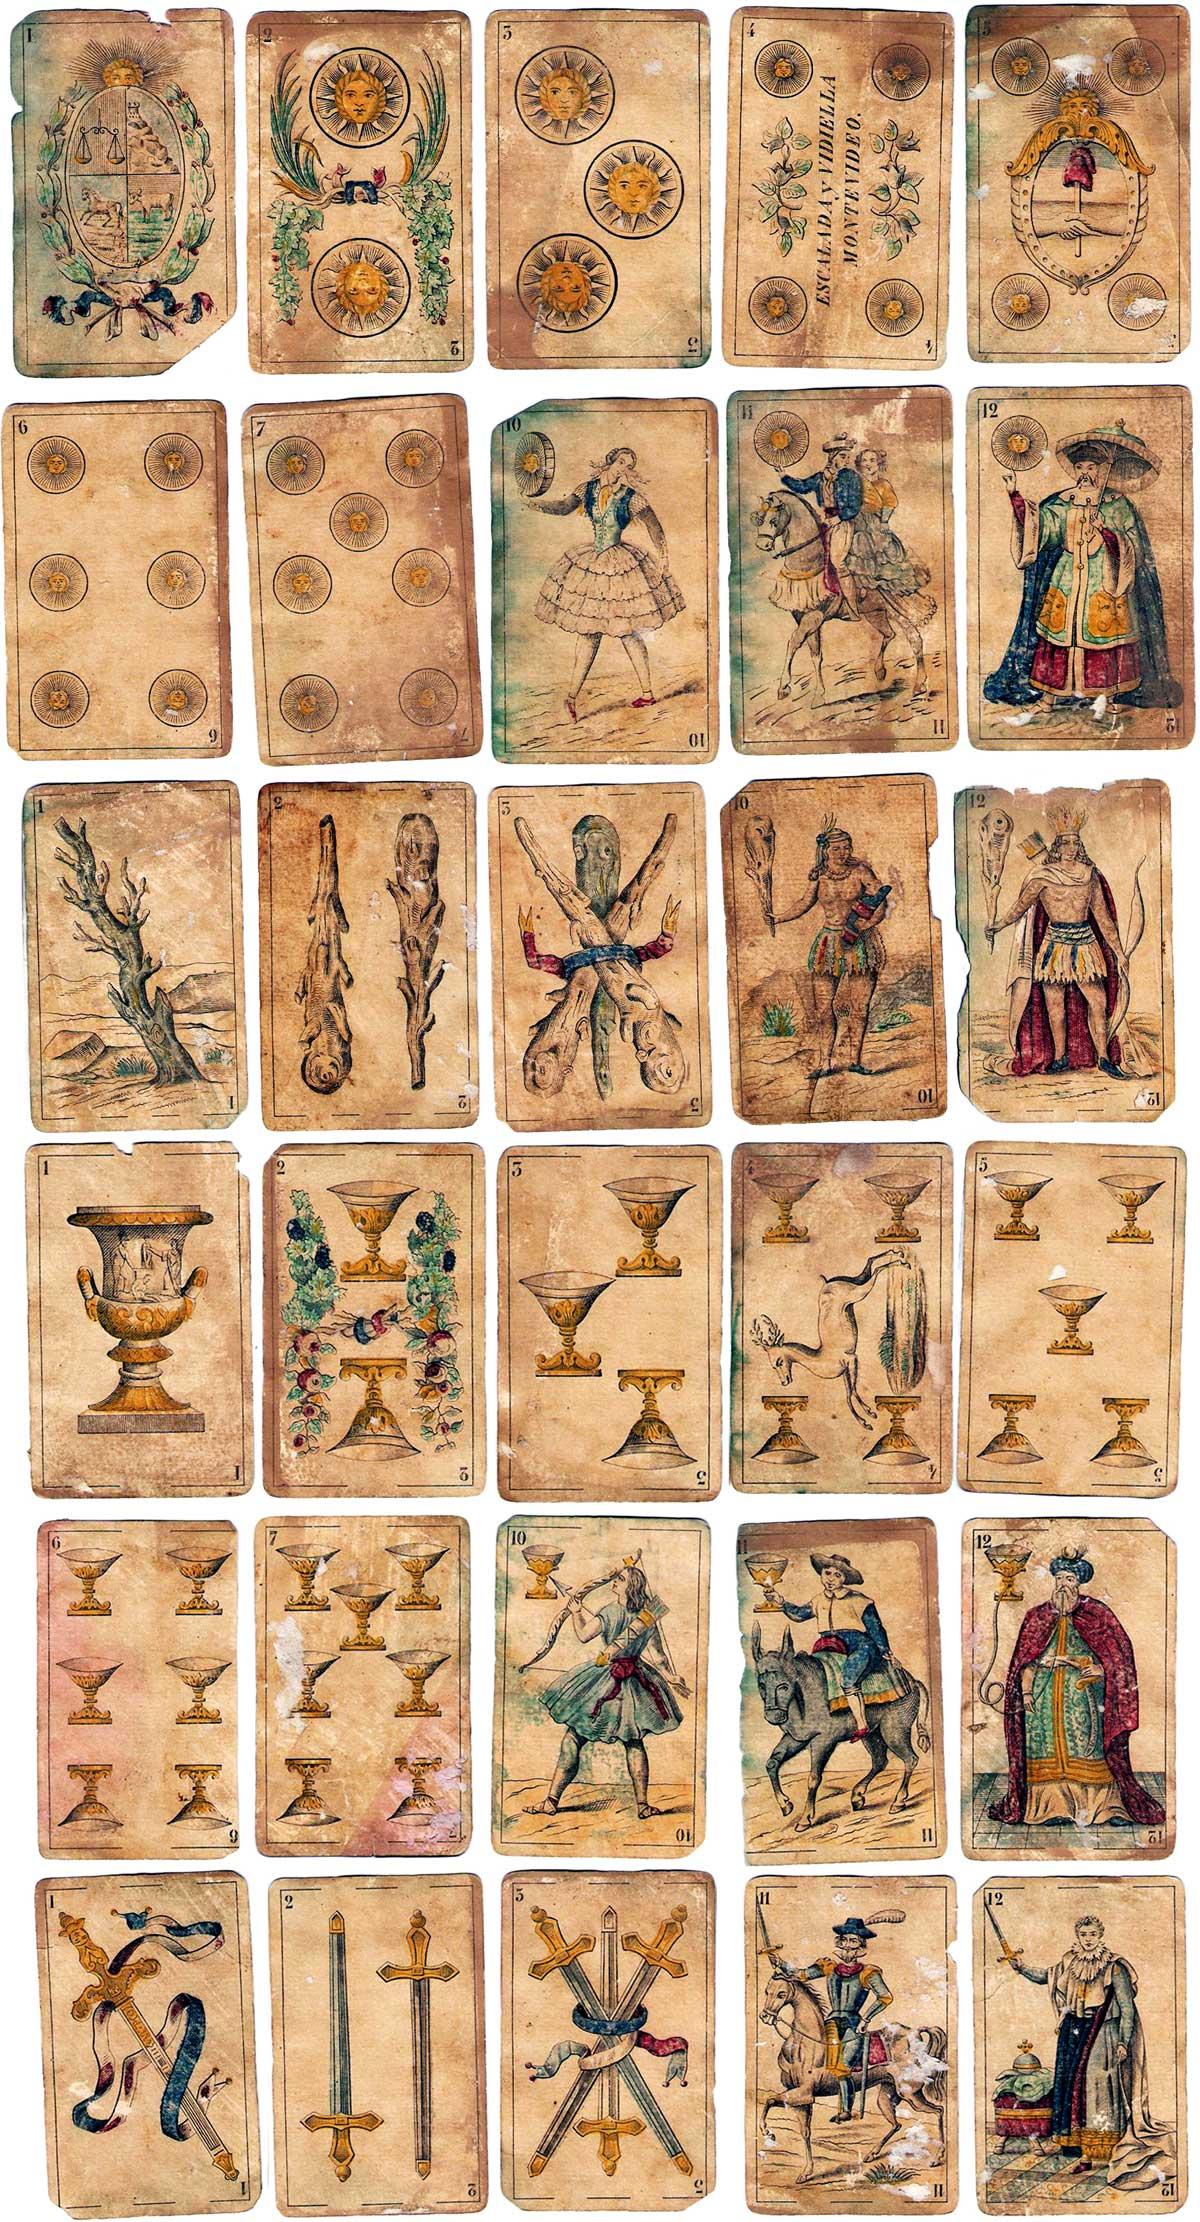 40-card pack made in Belgium by Antoine van Genechten exclusively for the firm Escalada y Vidiella based in Montevideo (Uruguay) in c.1860